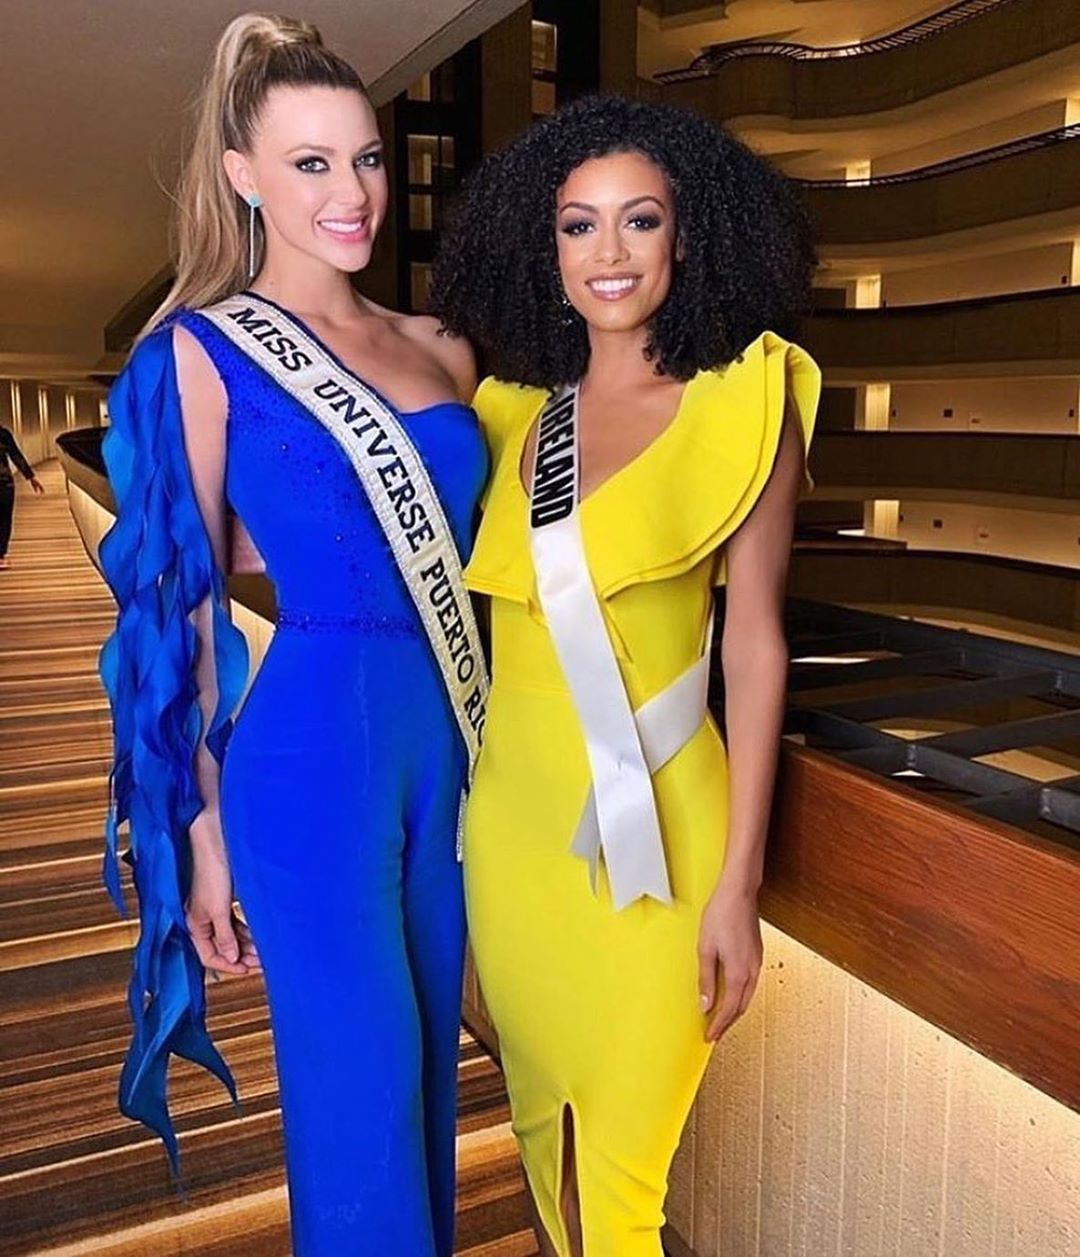 madison anderson, 1st runner-up de miss universe 2019. - Página 29 74713811